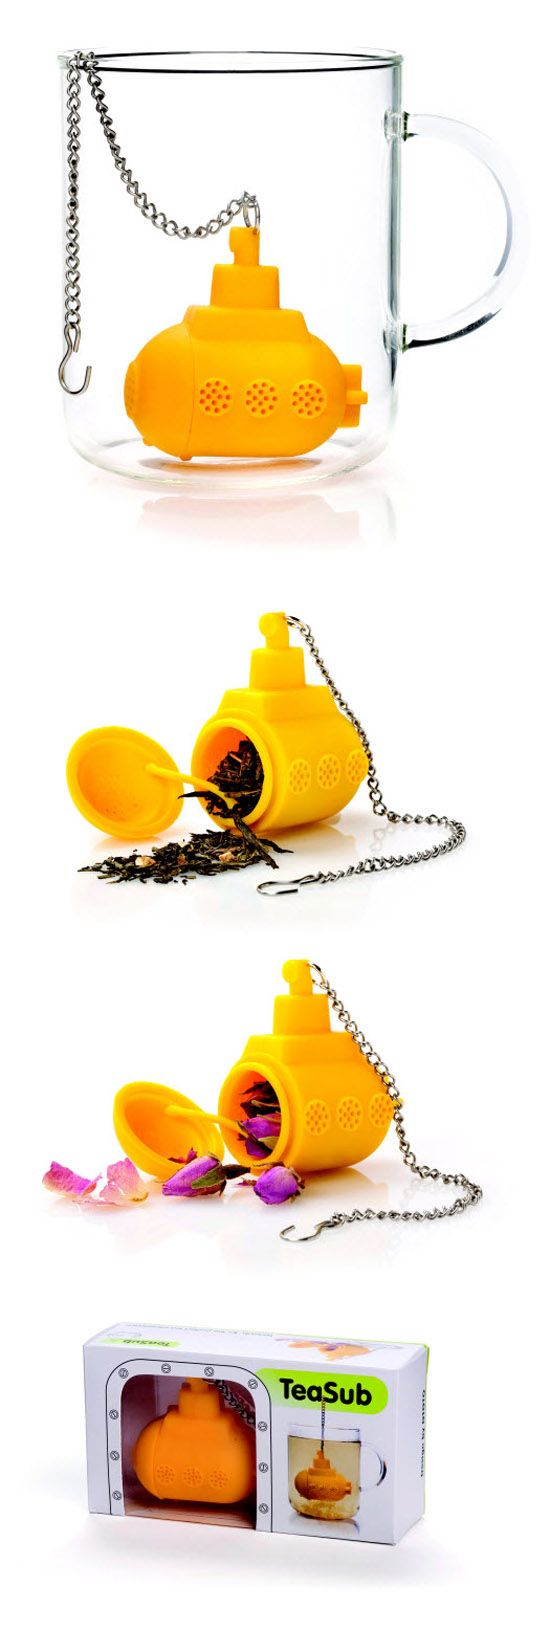 Tea Sub Yellow Submarine Tea Infuser ( http://www.enjoymedia.ch/tea-sub-yellow-submarine-tea-infuser-p-3288.html )